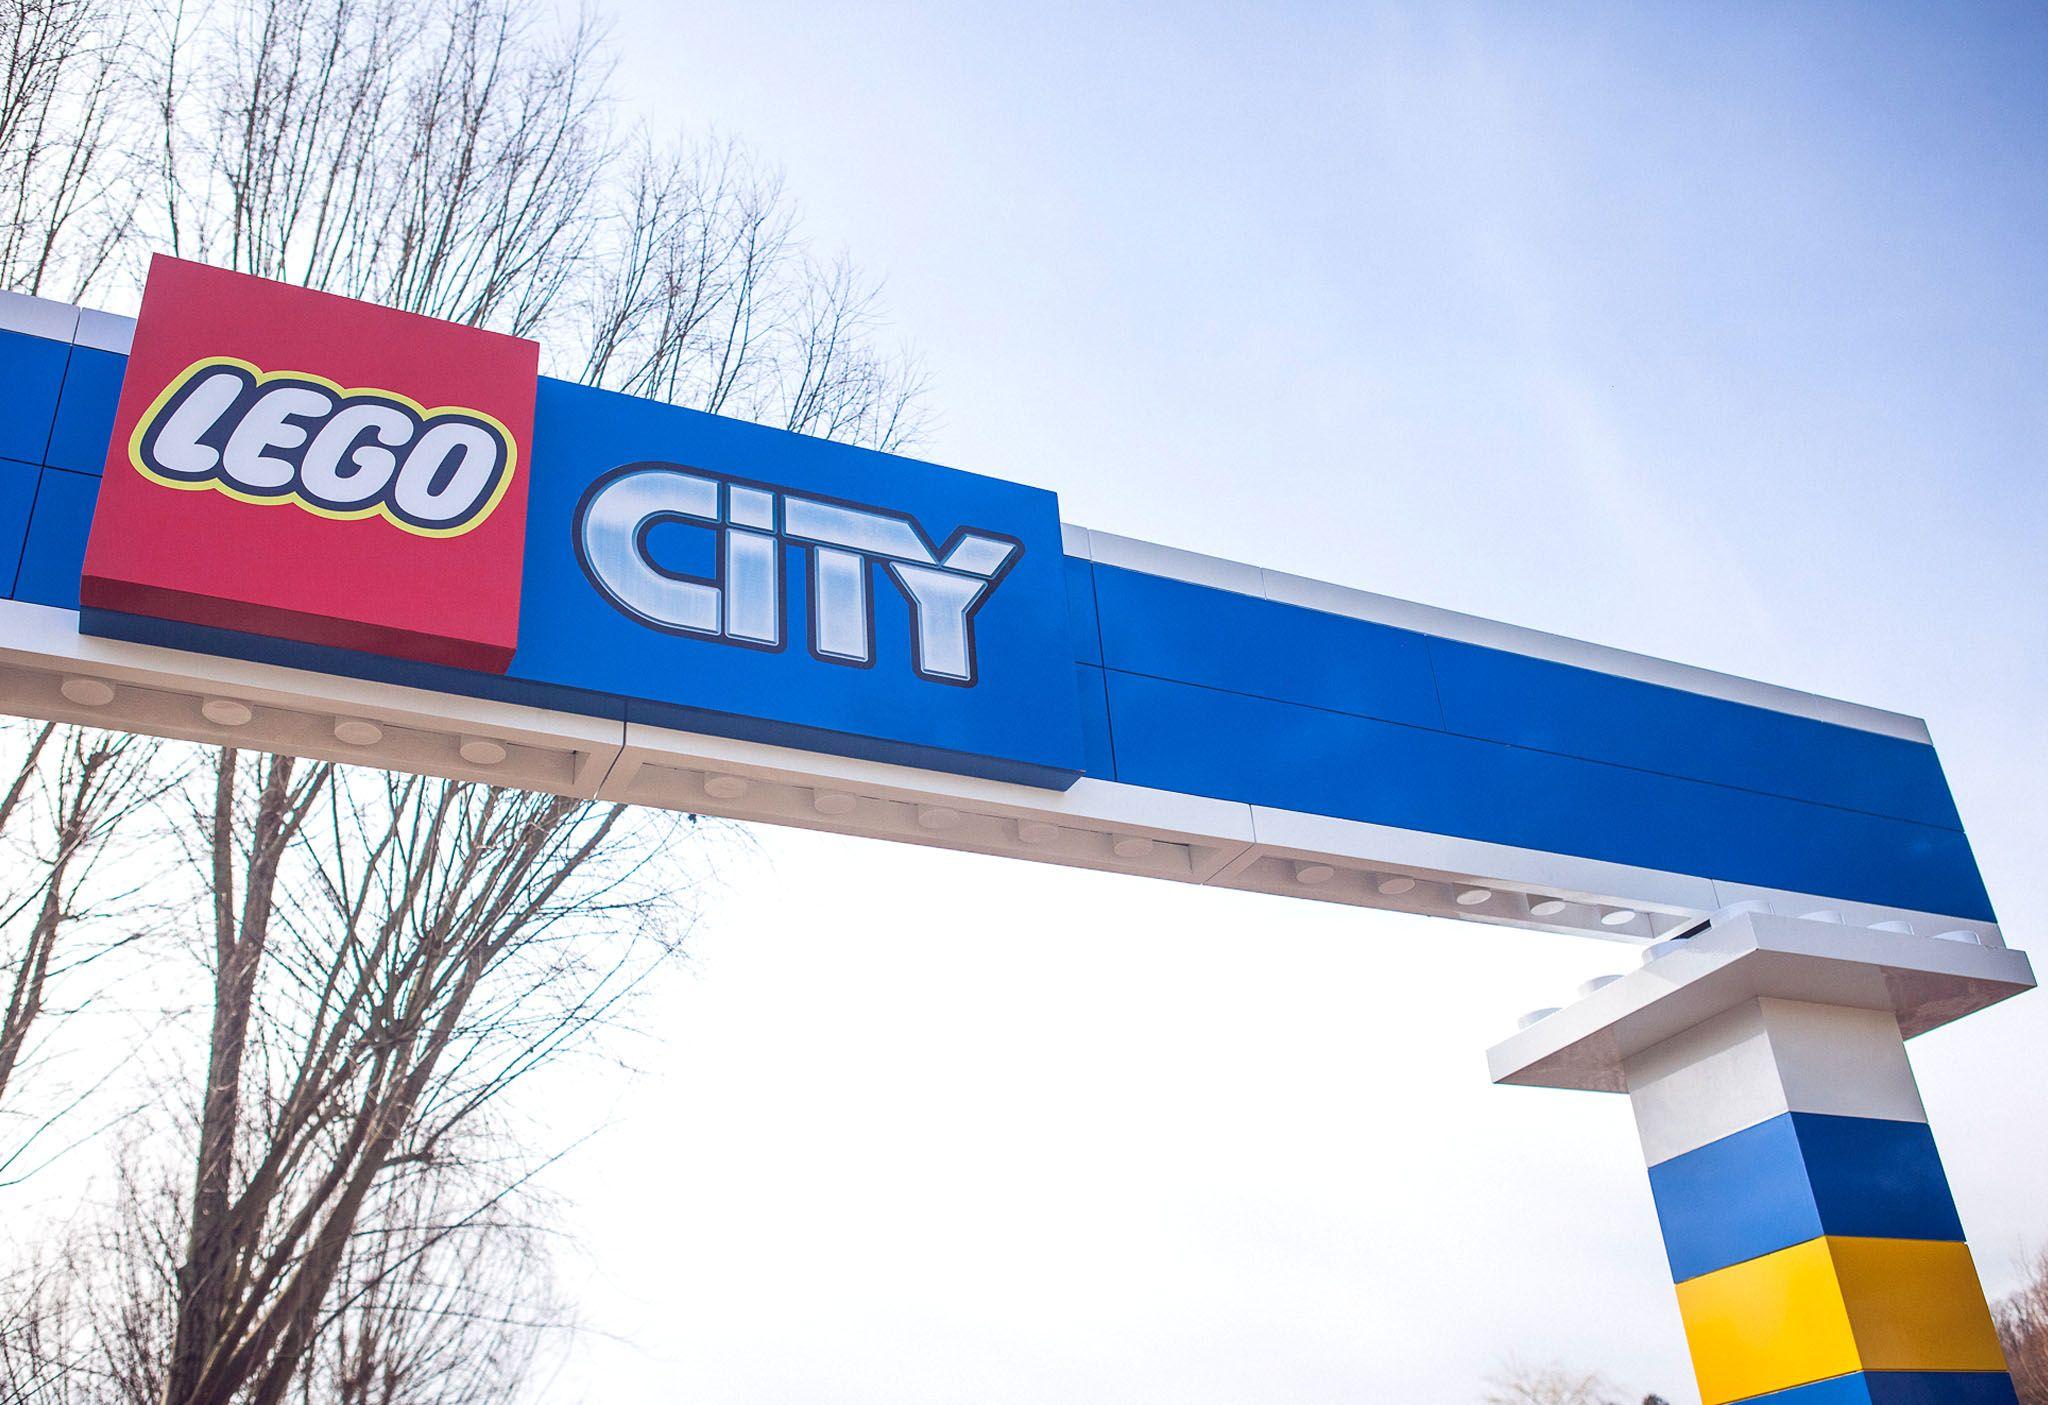 #LEGO CITY at #LEGOLAND #Windsor, #design, #theming, @scruffydogltd and #Merlin Magic Making